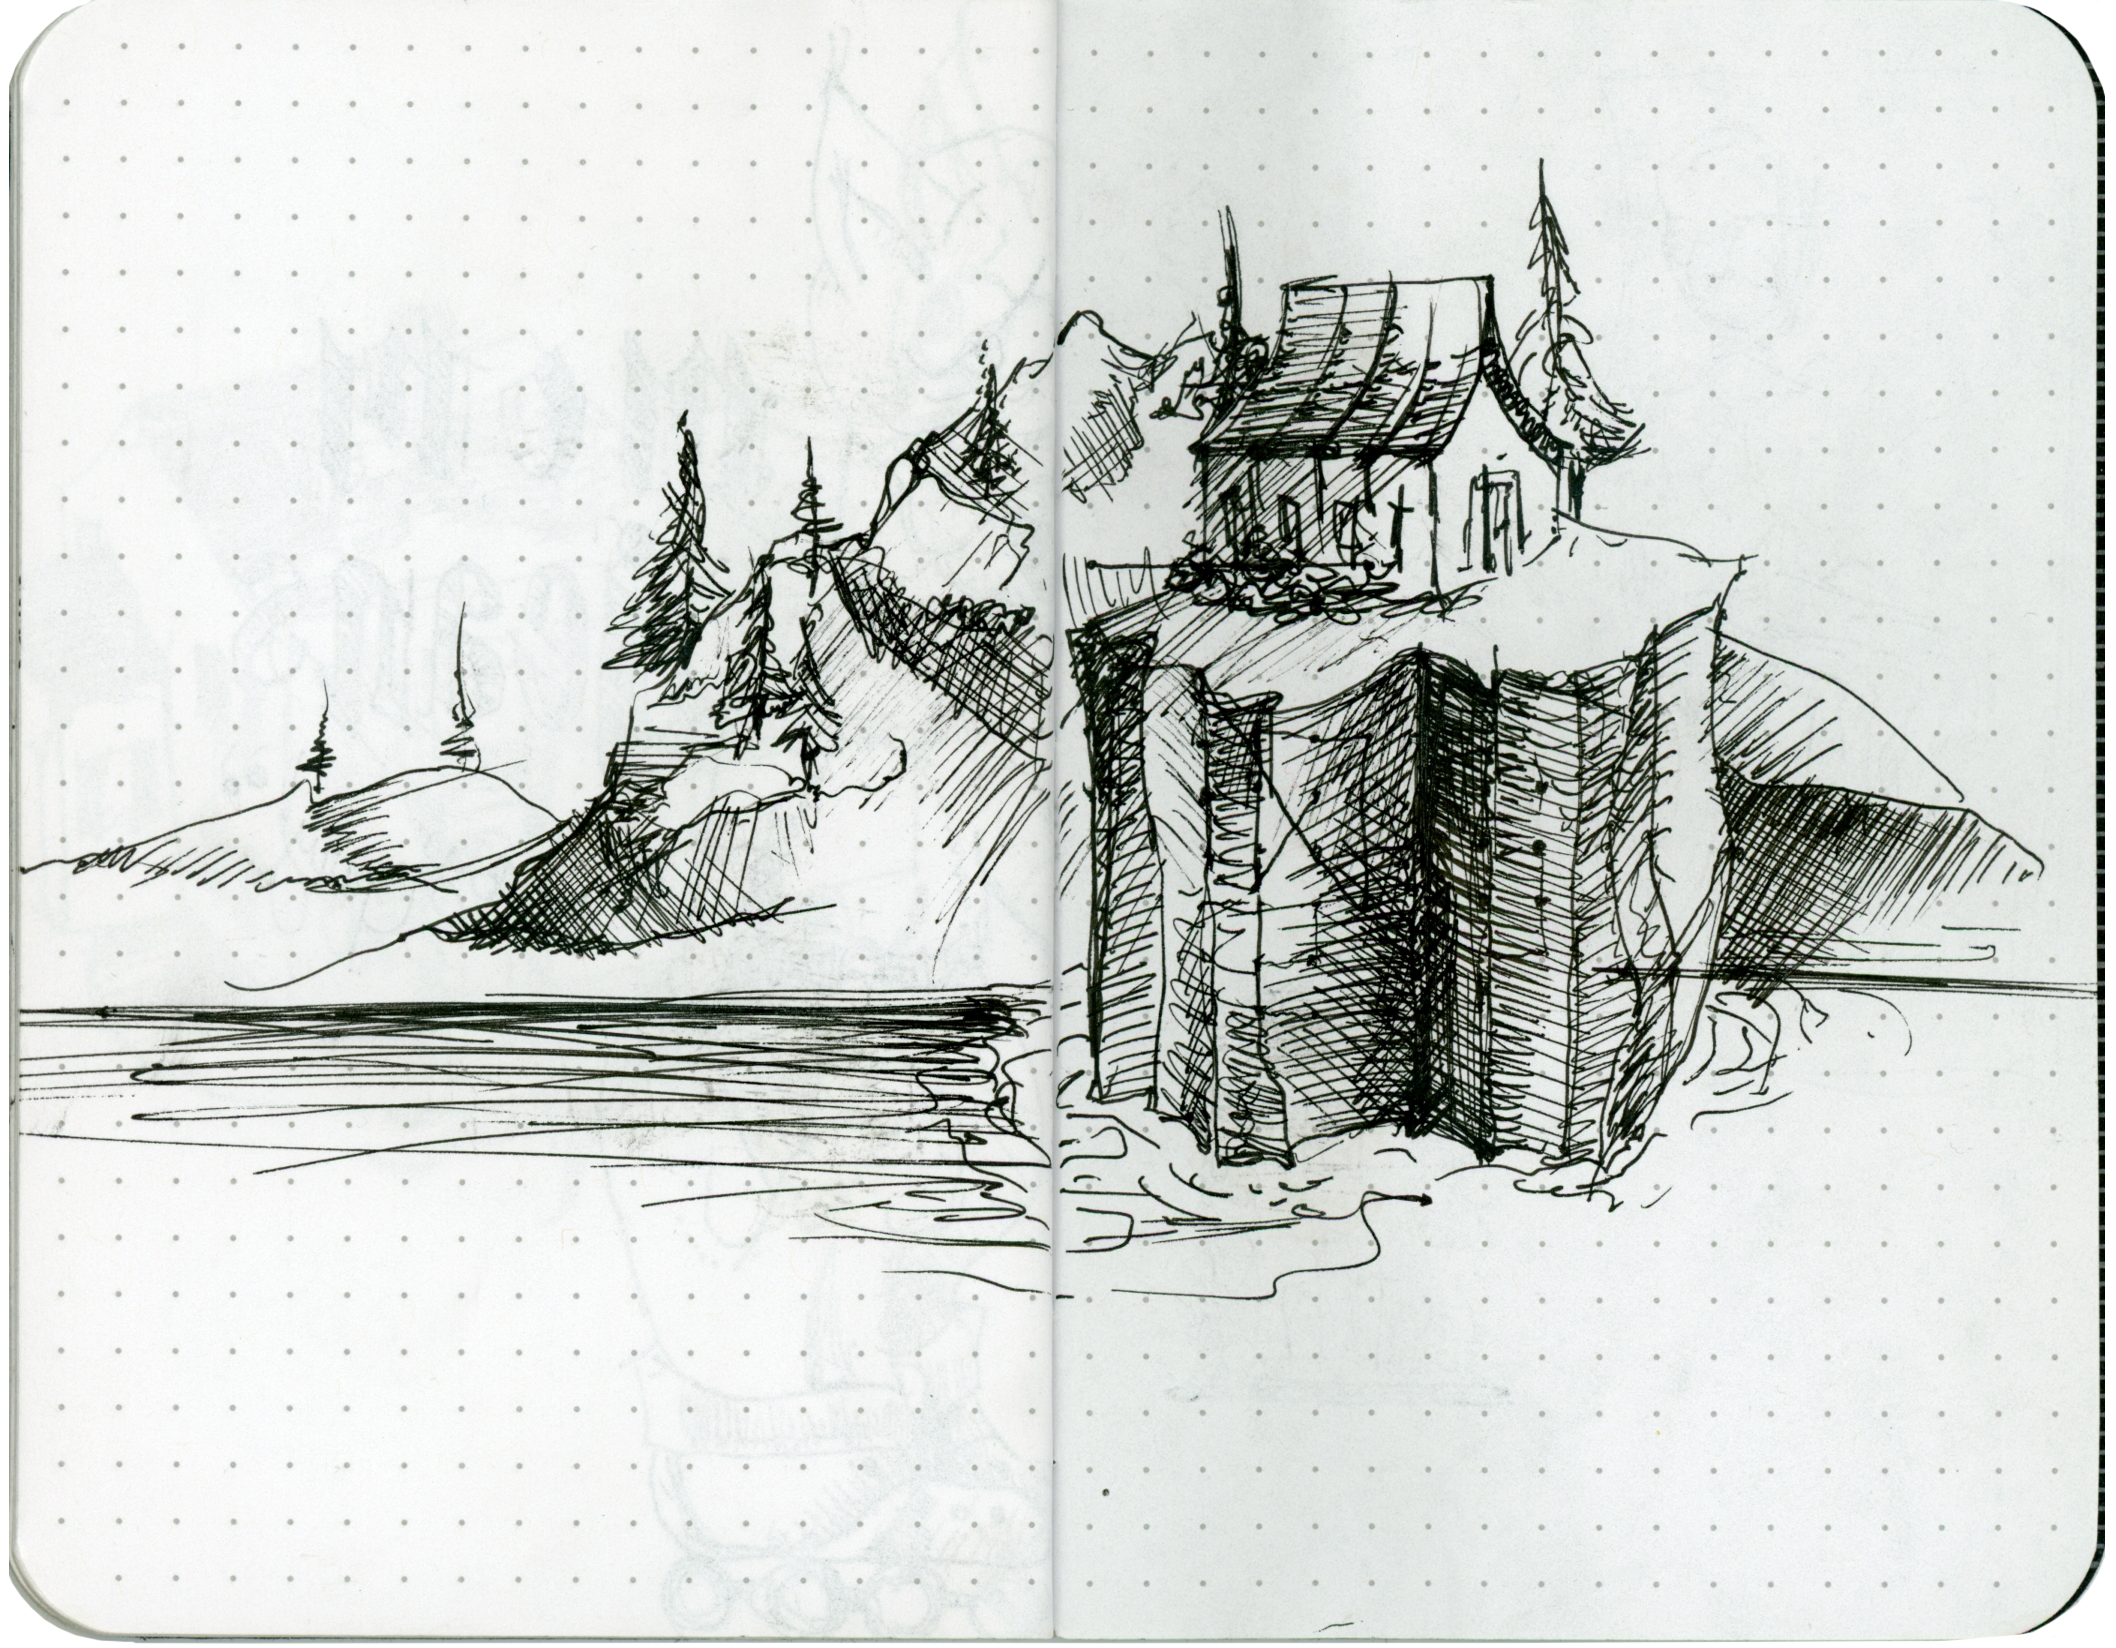 Sketchbook_021_0001_Layer-14.png